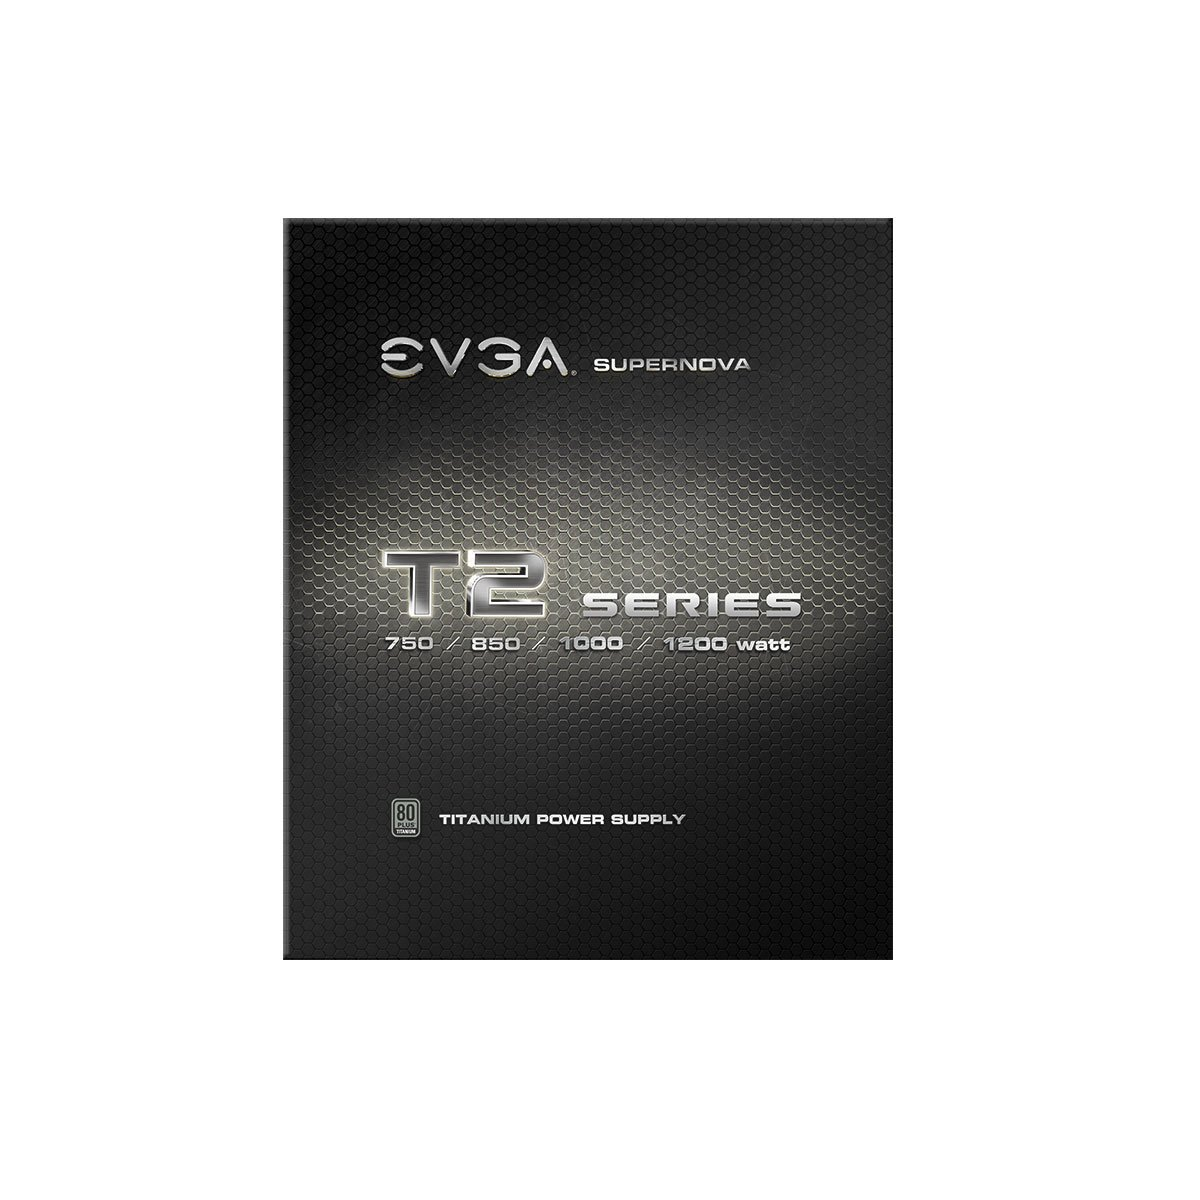 EVGA SuperNOVA 1000 T2, 80+ TITANIUM 1000W, Fully Modular, EVGA ECO Mode, 10 Year Warranty , Includes FREE Power On Self Tester, Power Supply 220-T2-1000-X1 by EVGA (Image #2)